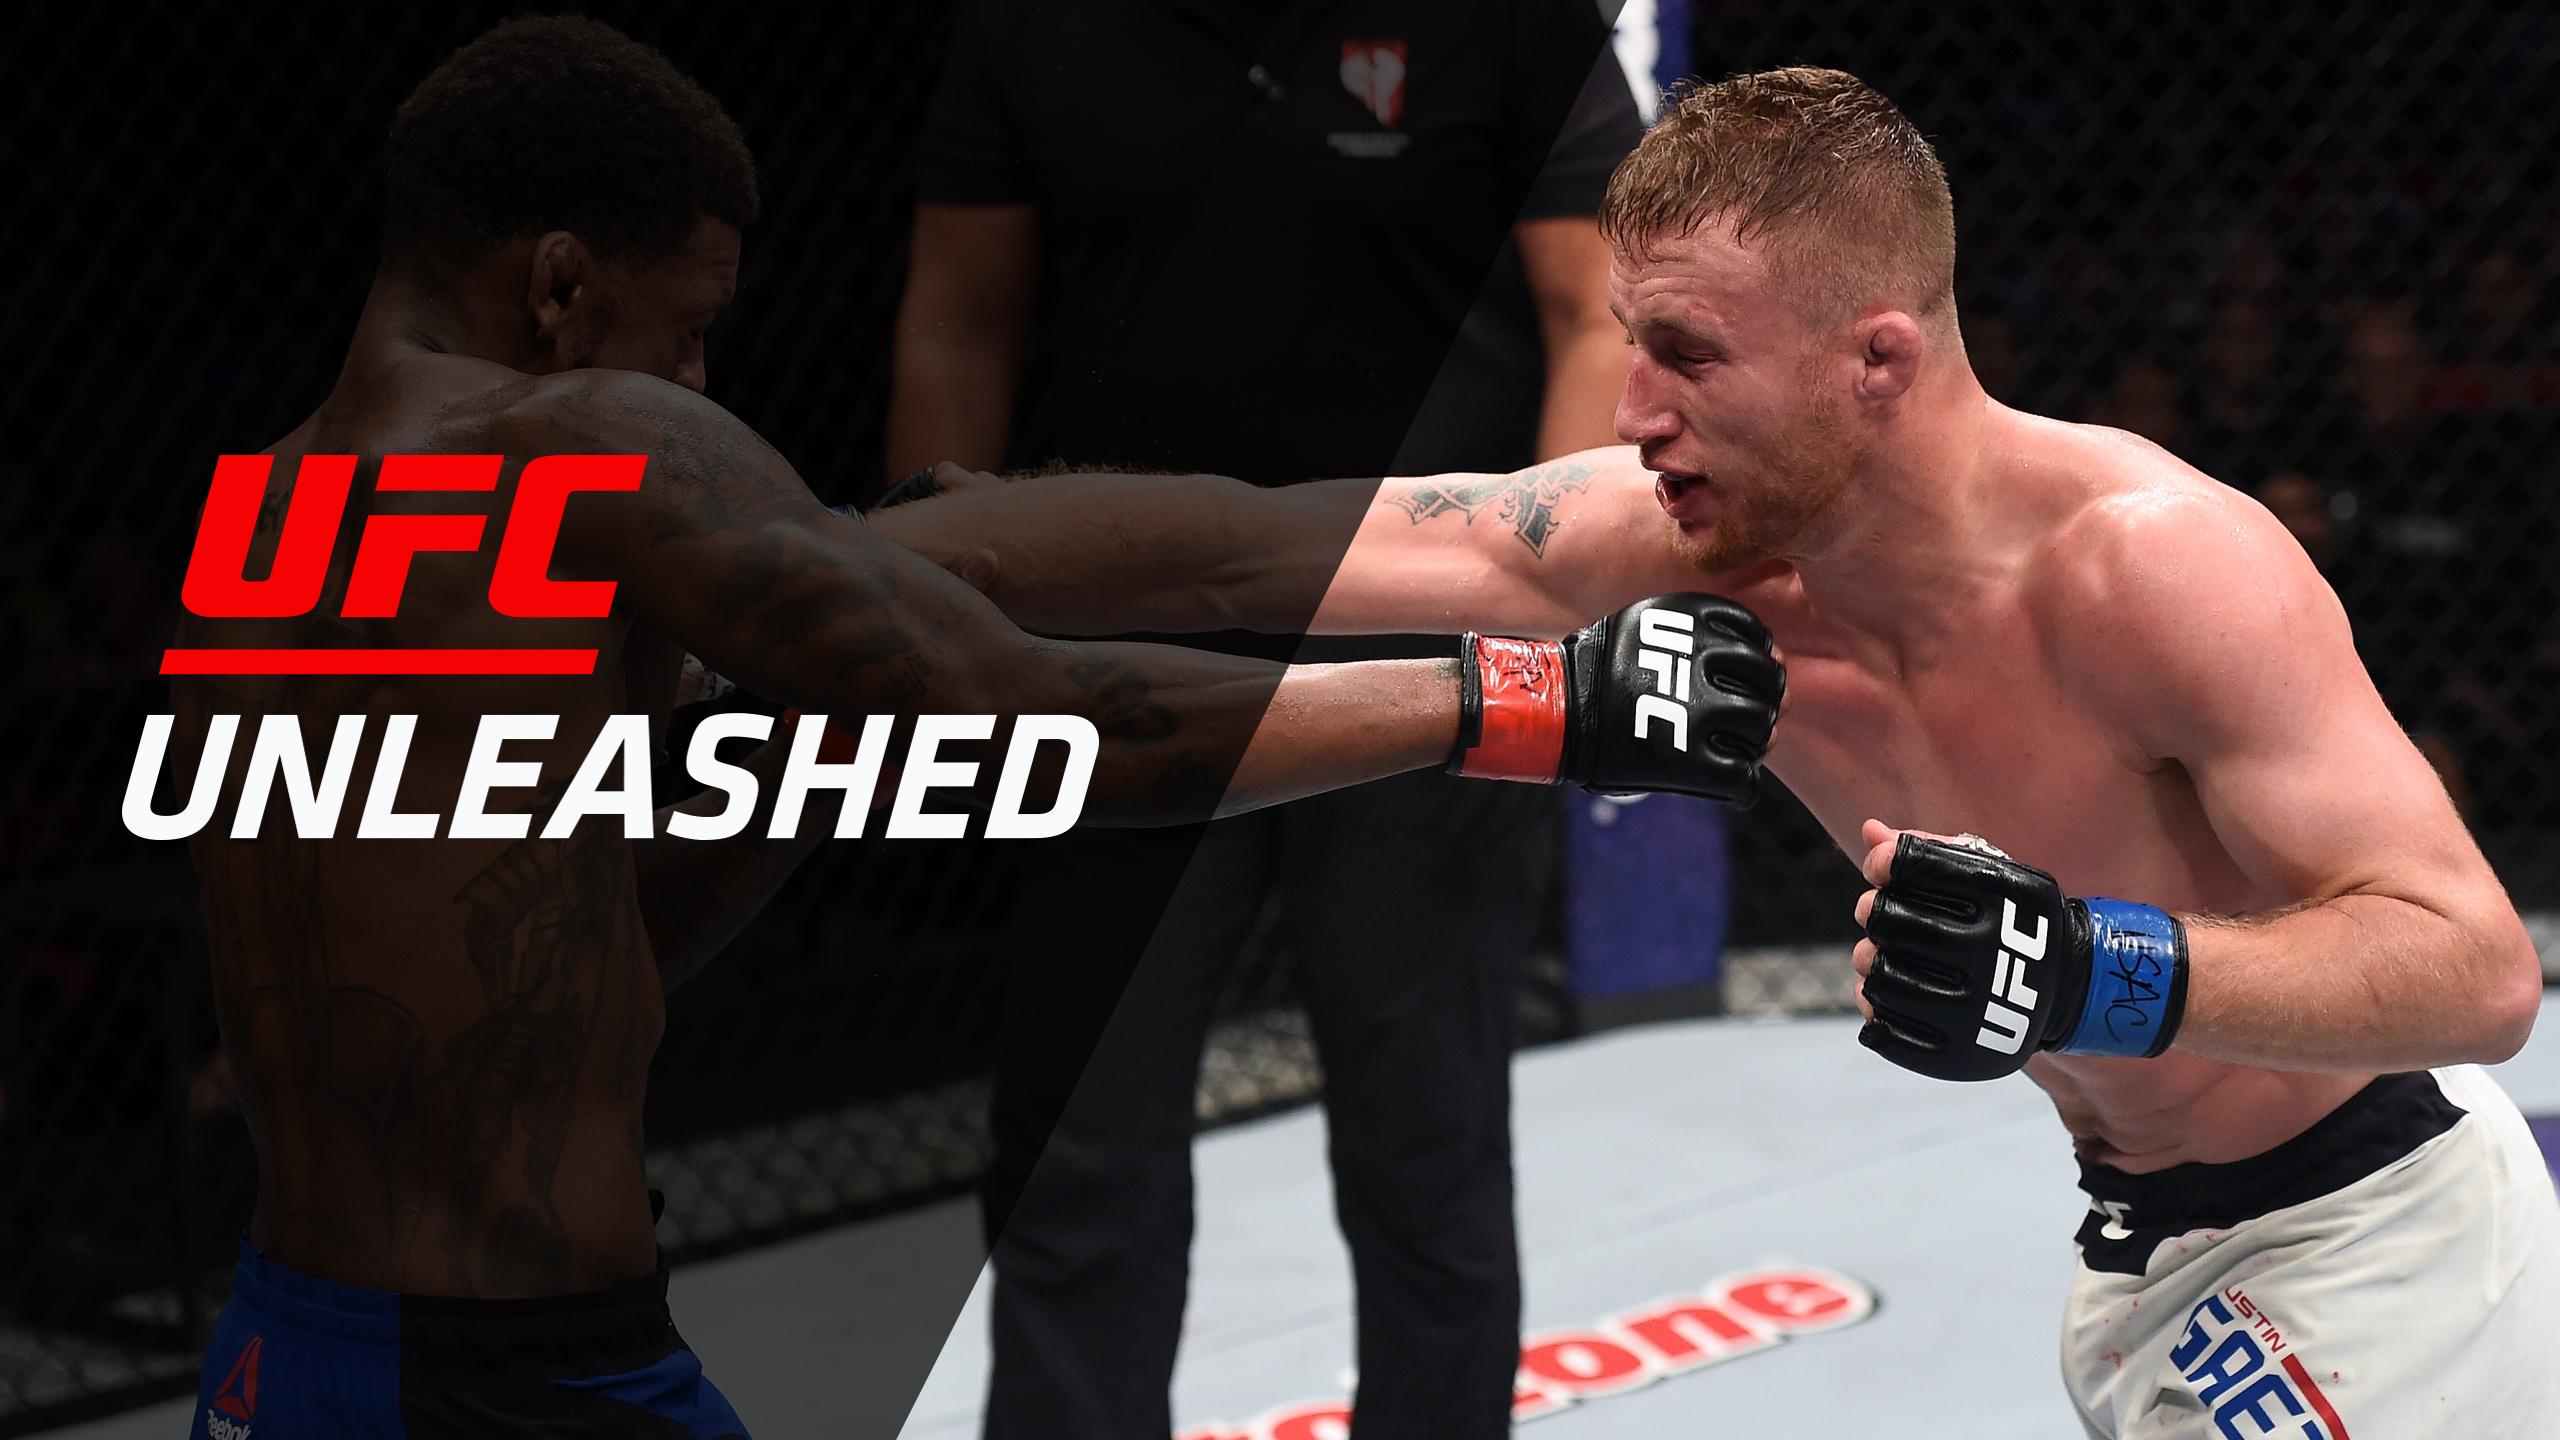 UFC Unleashed: M. Johnson vs. Gaethje